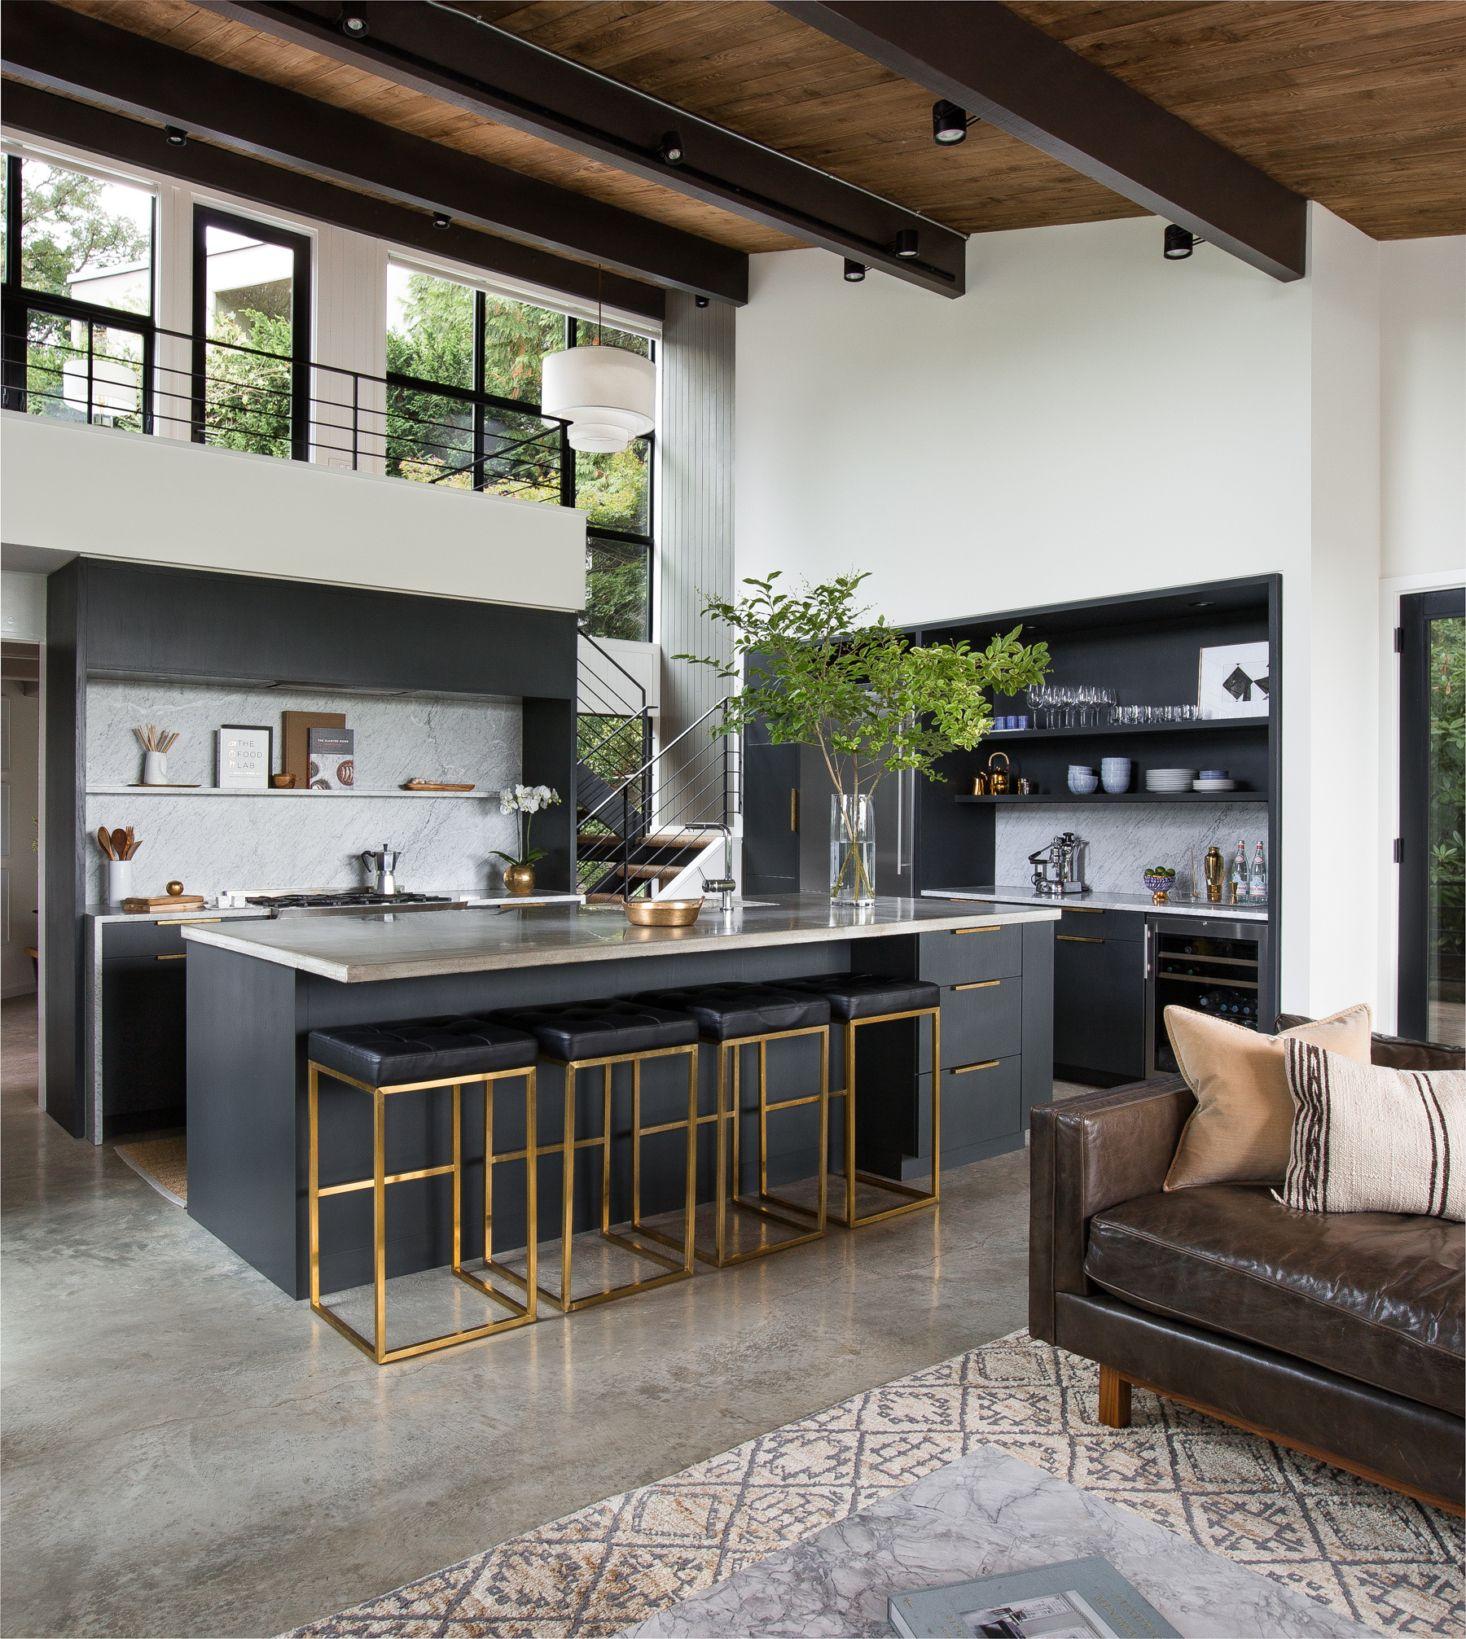 Best Professional Kitchen Montlake Residence By Mowery Marsh Architects And Kaylen Flugel Design Remodelista Interior Design Kitchen Home Decor Kitchen Modern Kitchen Design